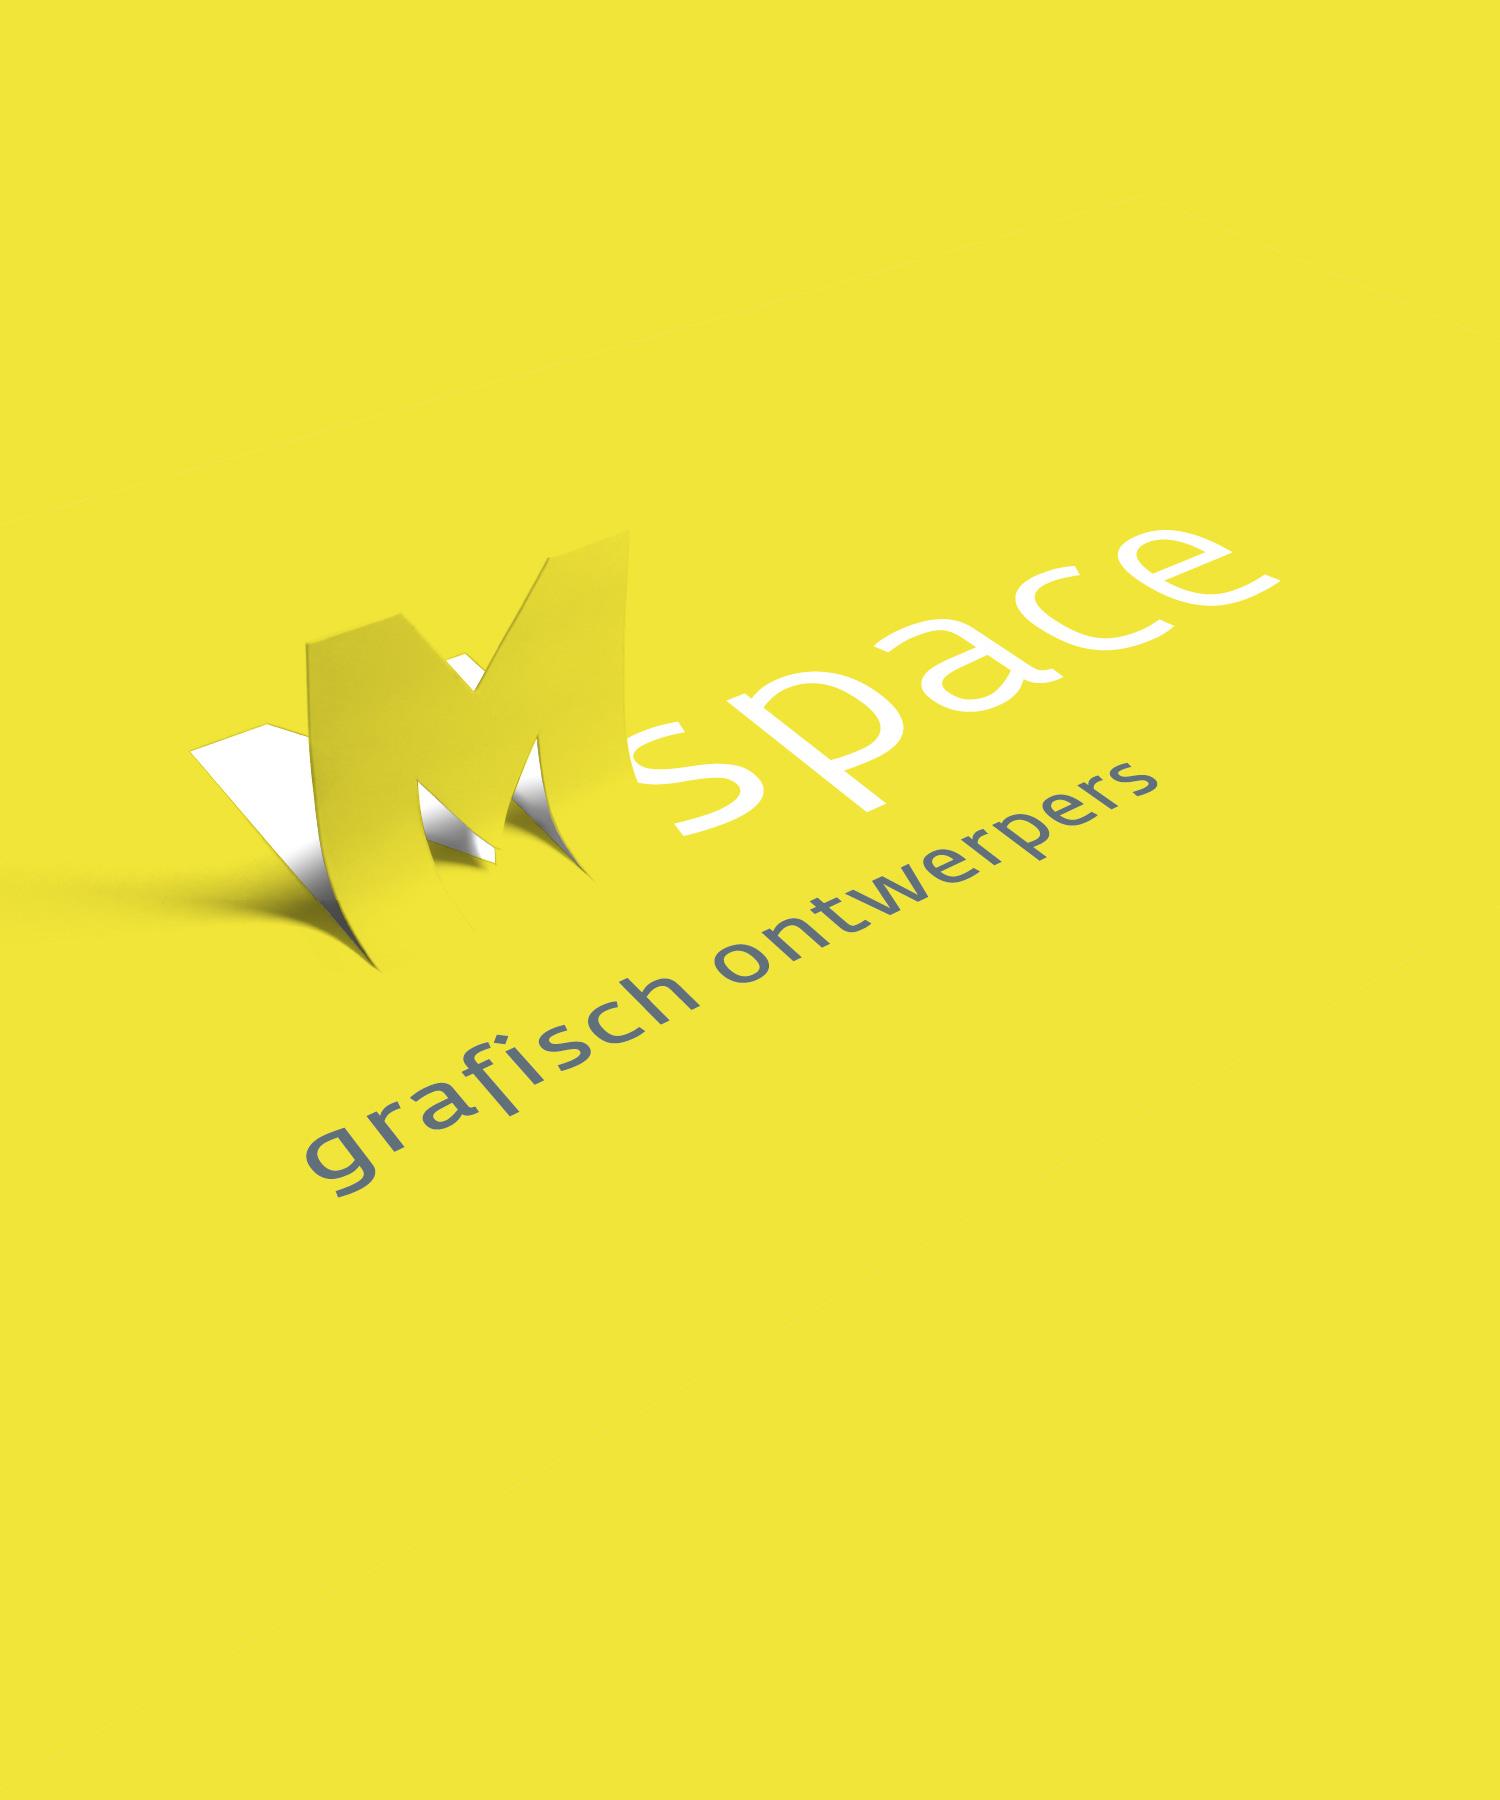 M-space logo